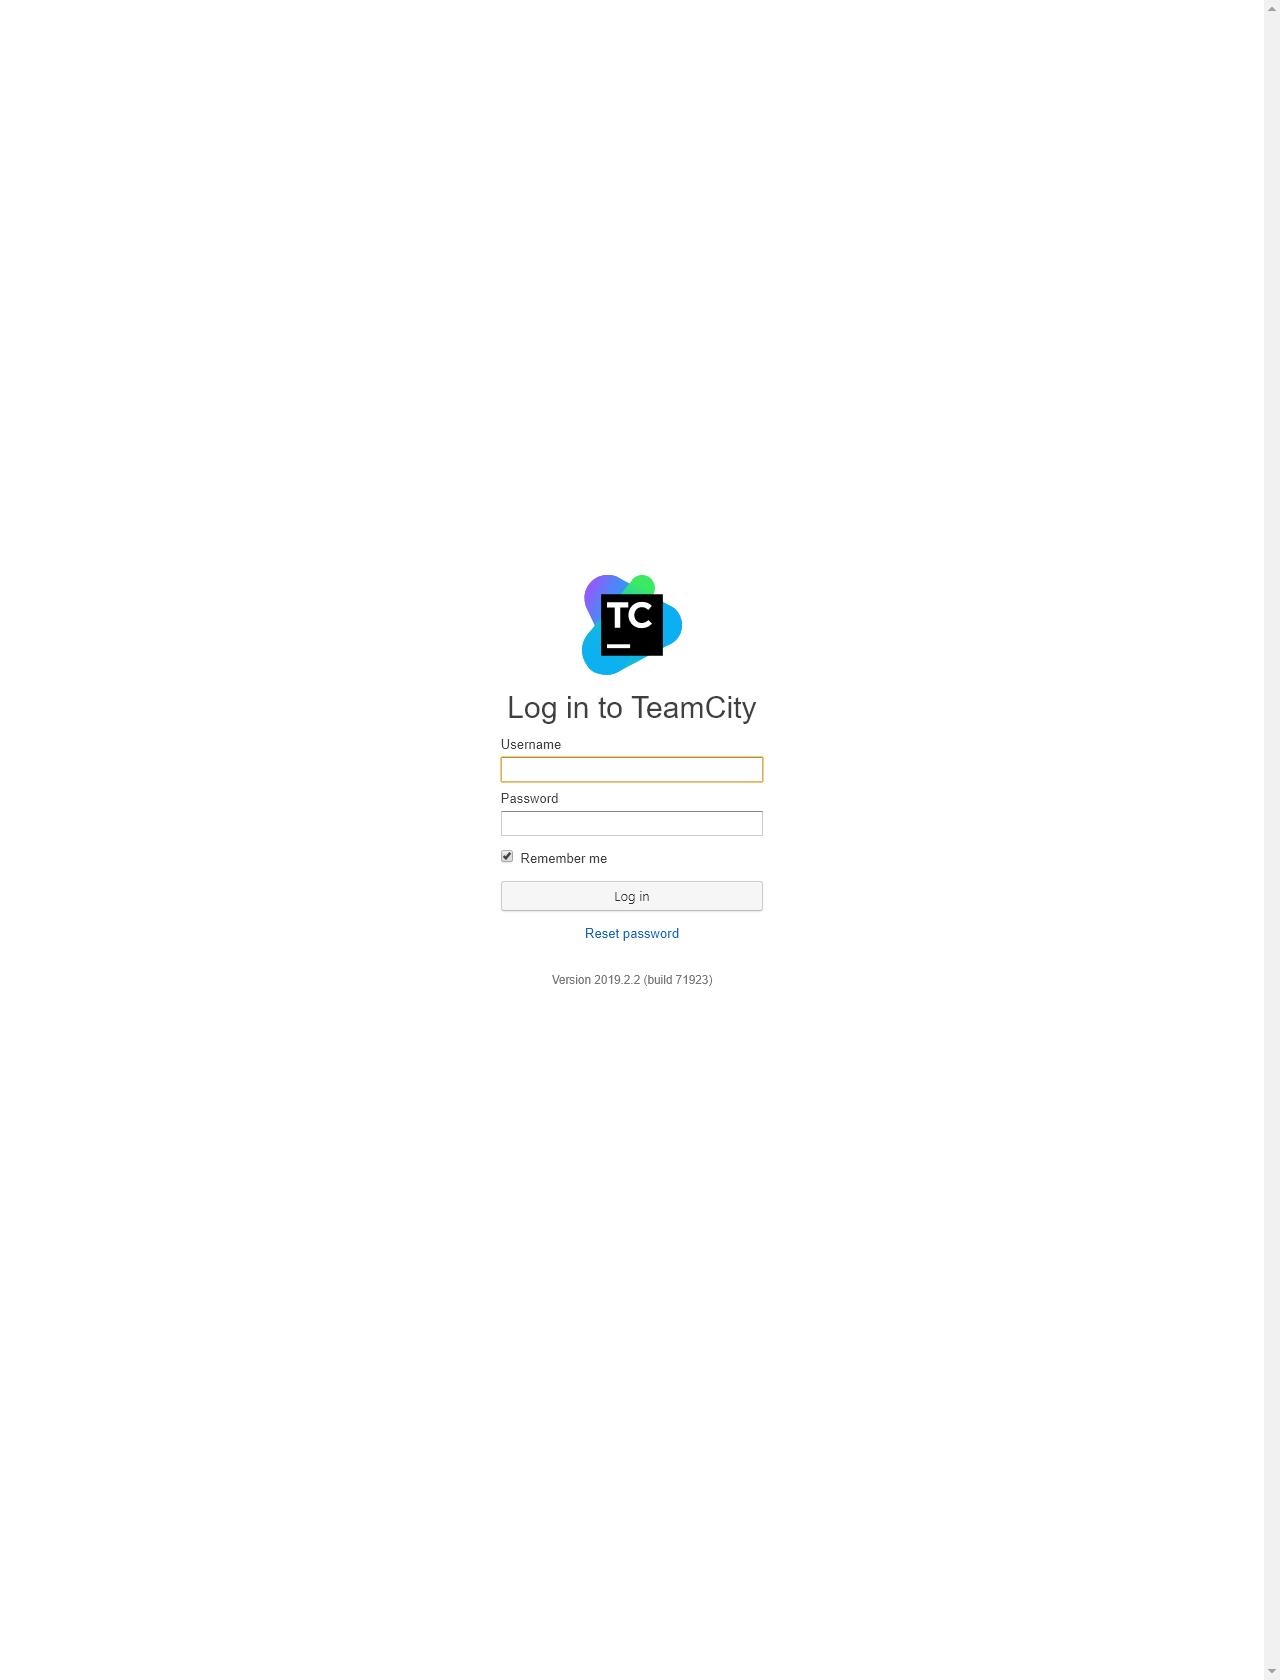 Screenshot Desktop - https://cm-4151-api.qa.adaptbydesign.com.au/login.html